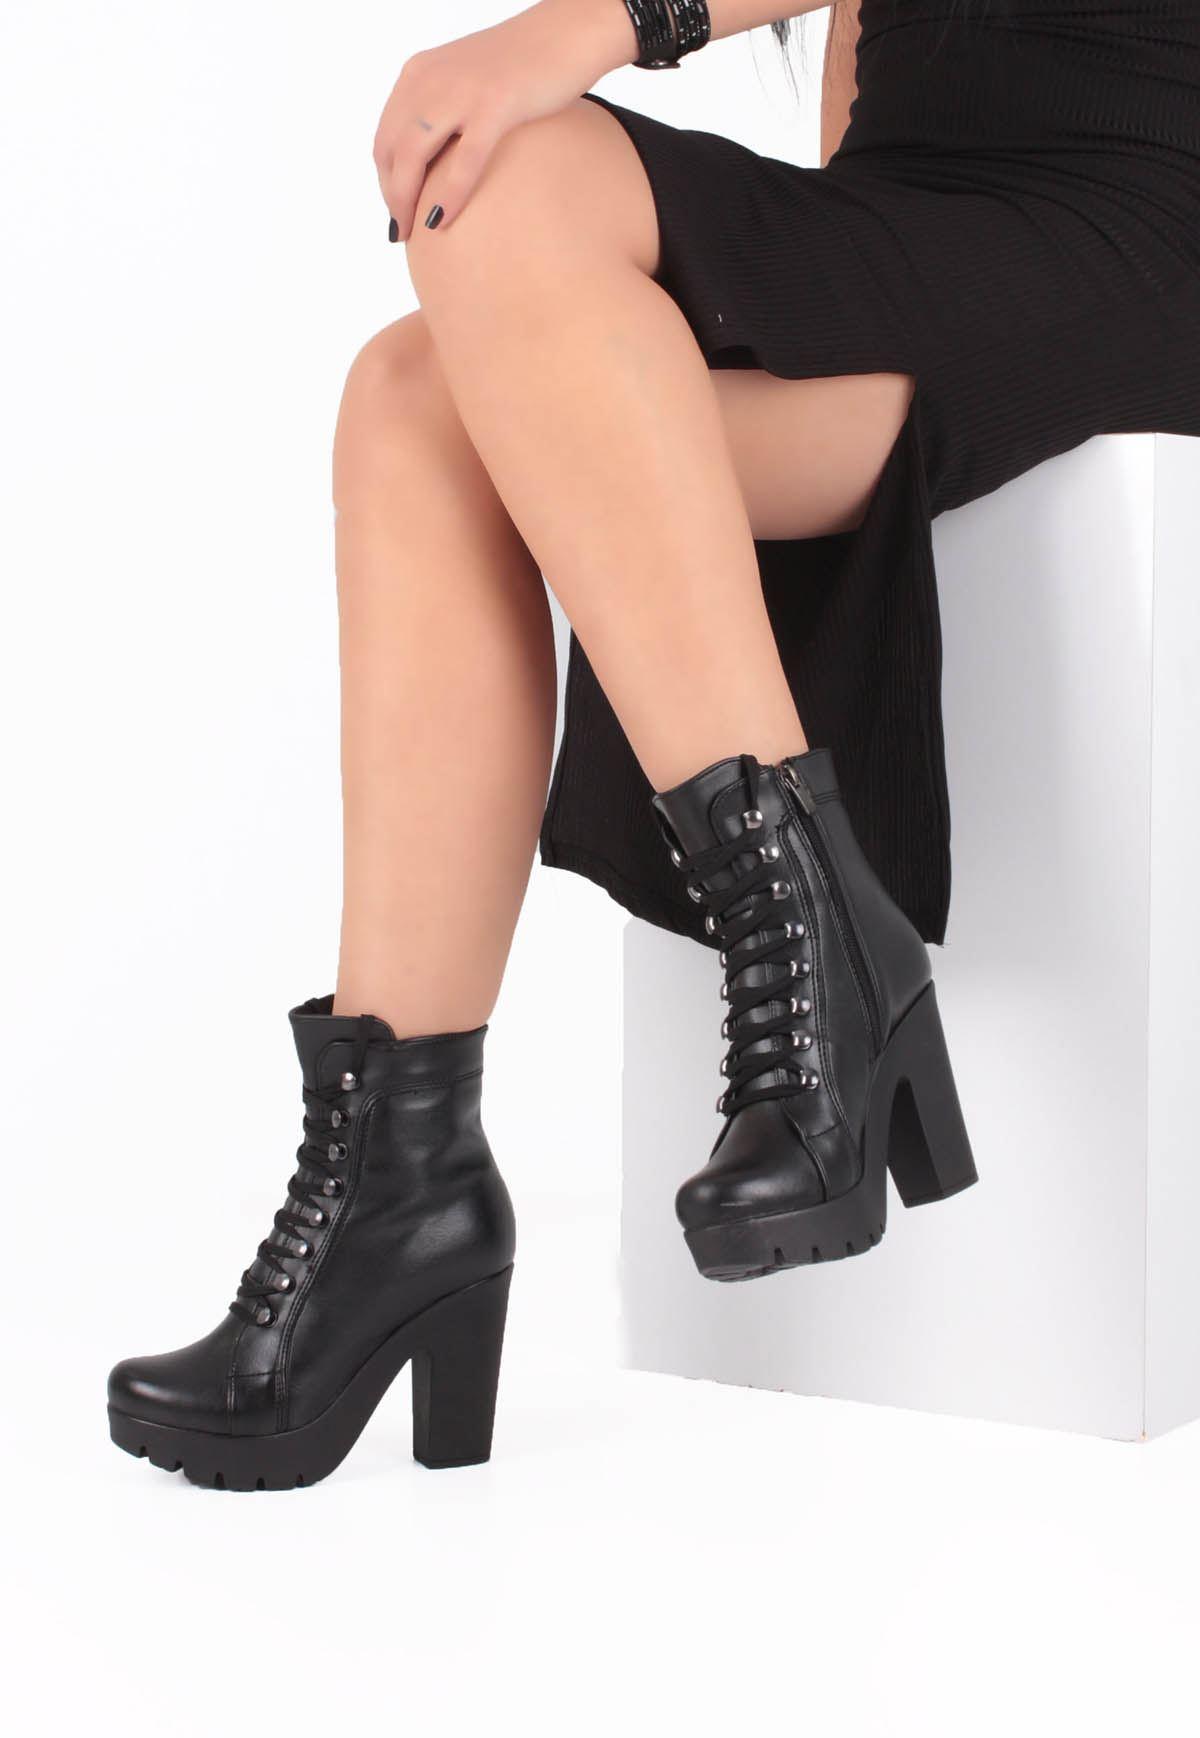 Erb Siyah Cilt Çengel Bağcıklı Yüksek Topuk Bayan Bot